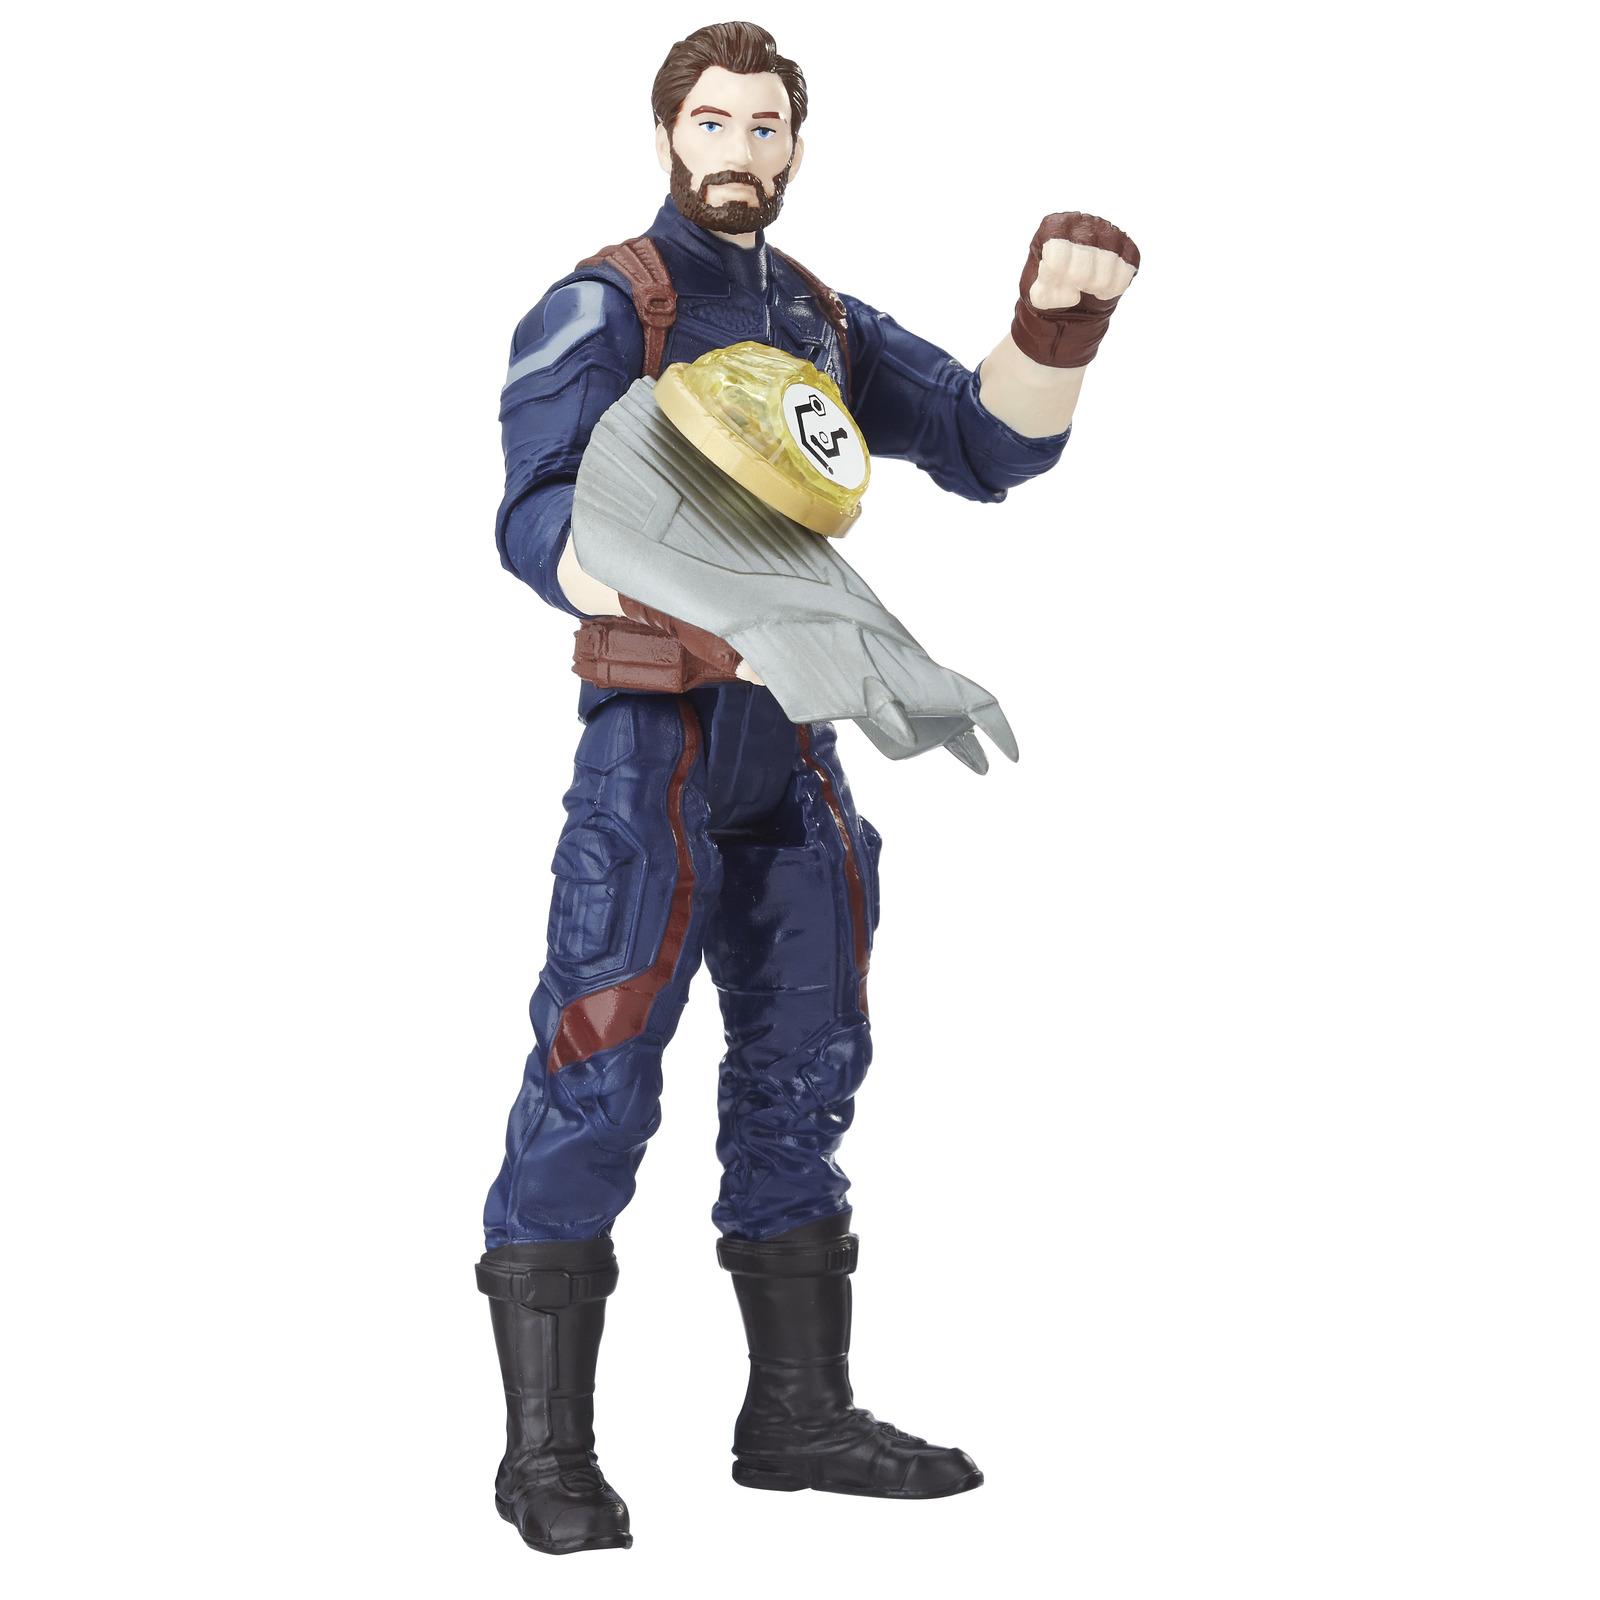 "Avengers Infinity War: Captain America - 6"" Action Figure image"